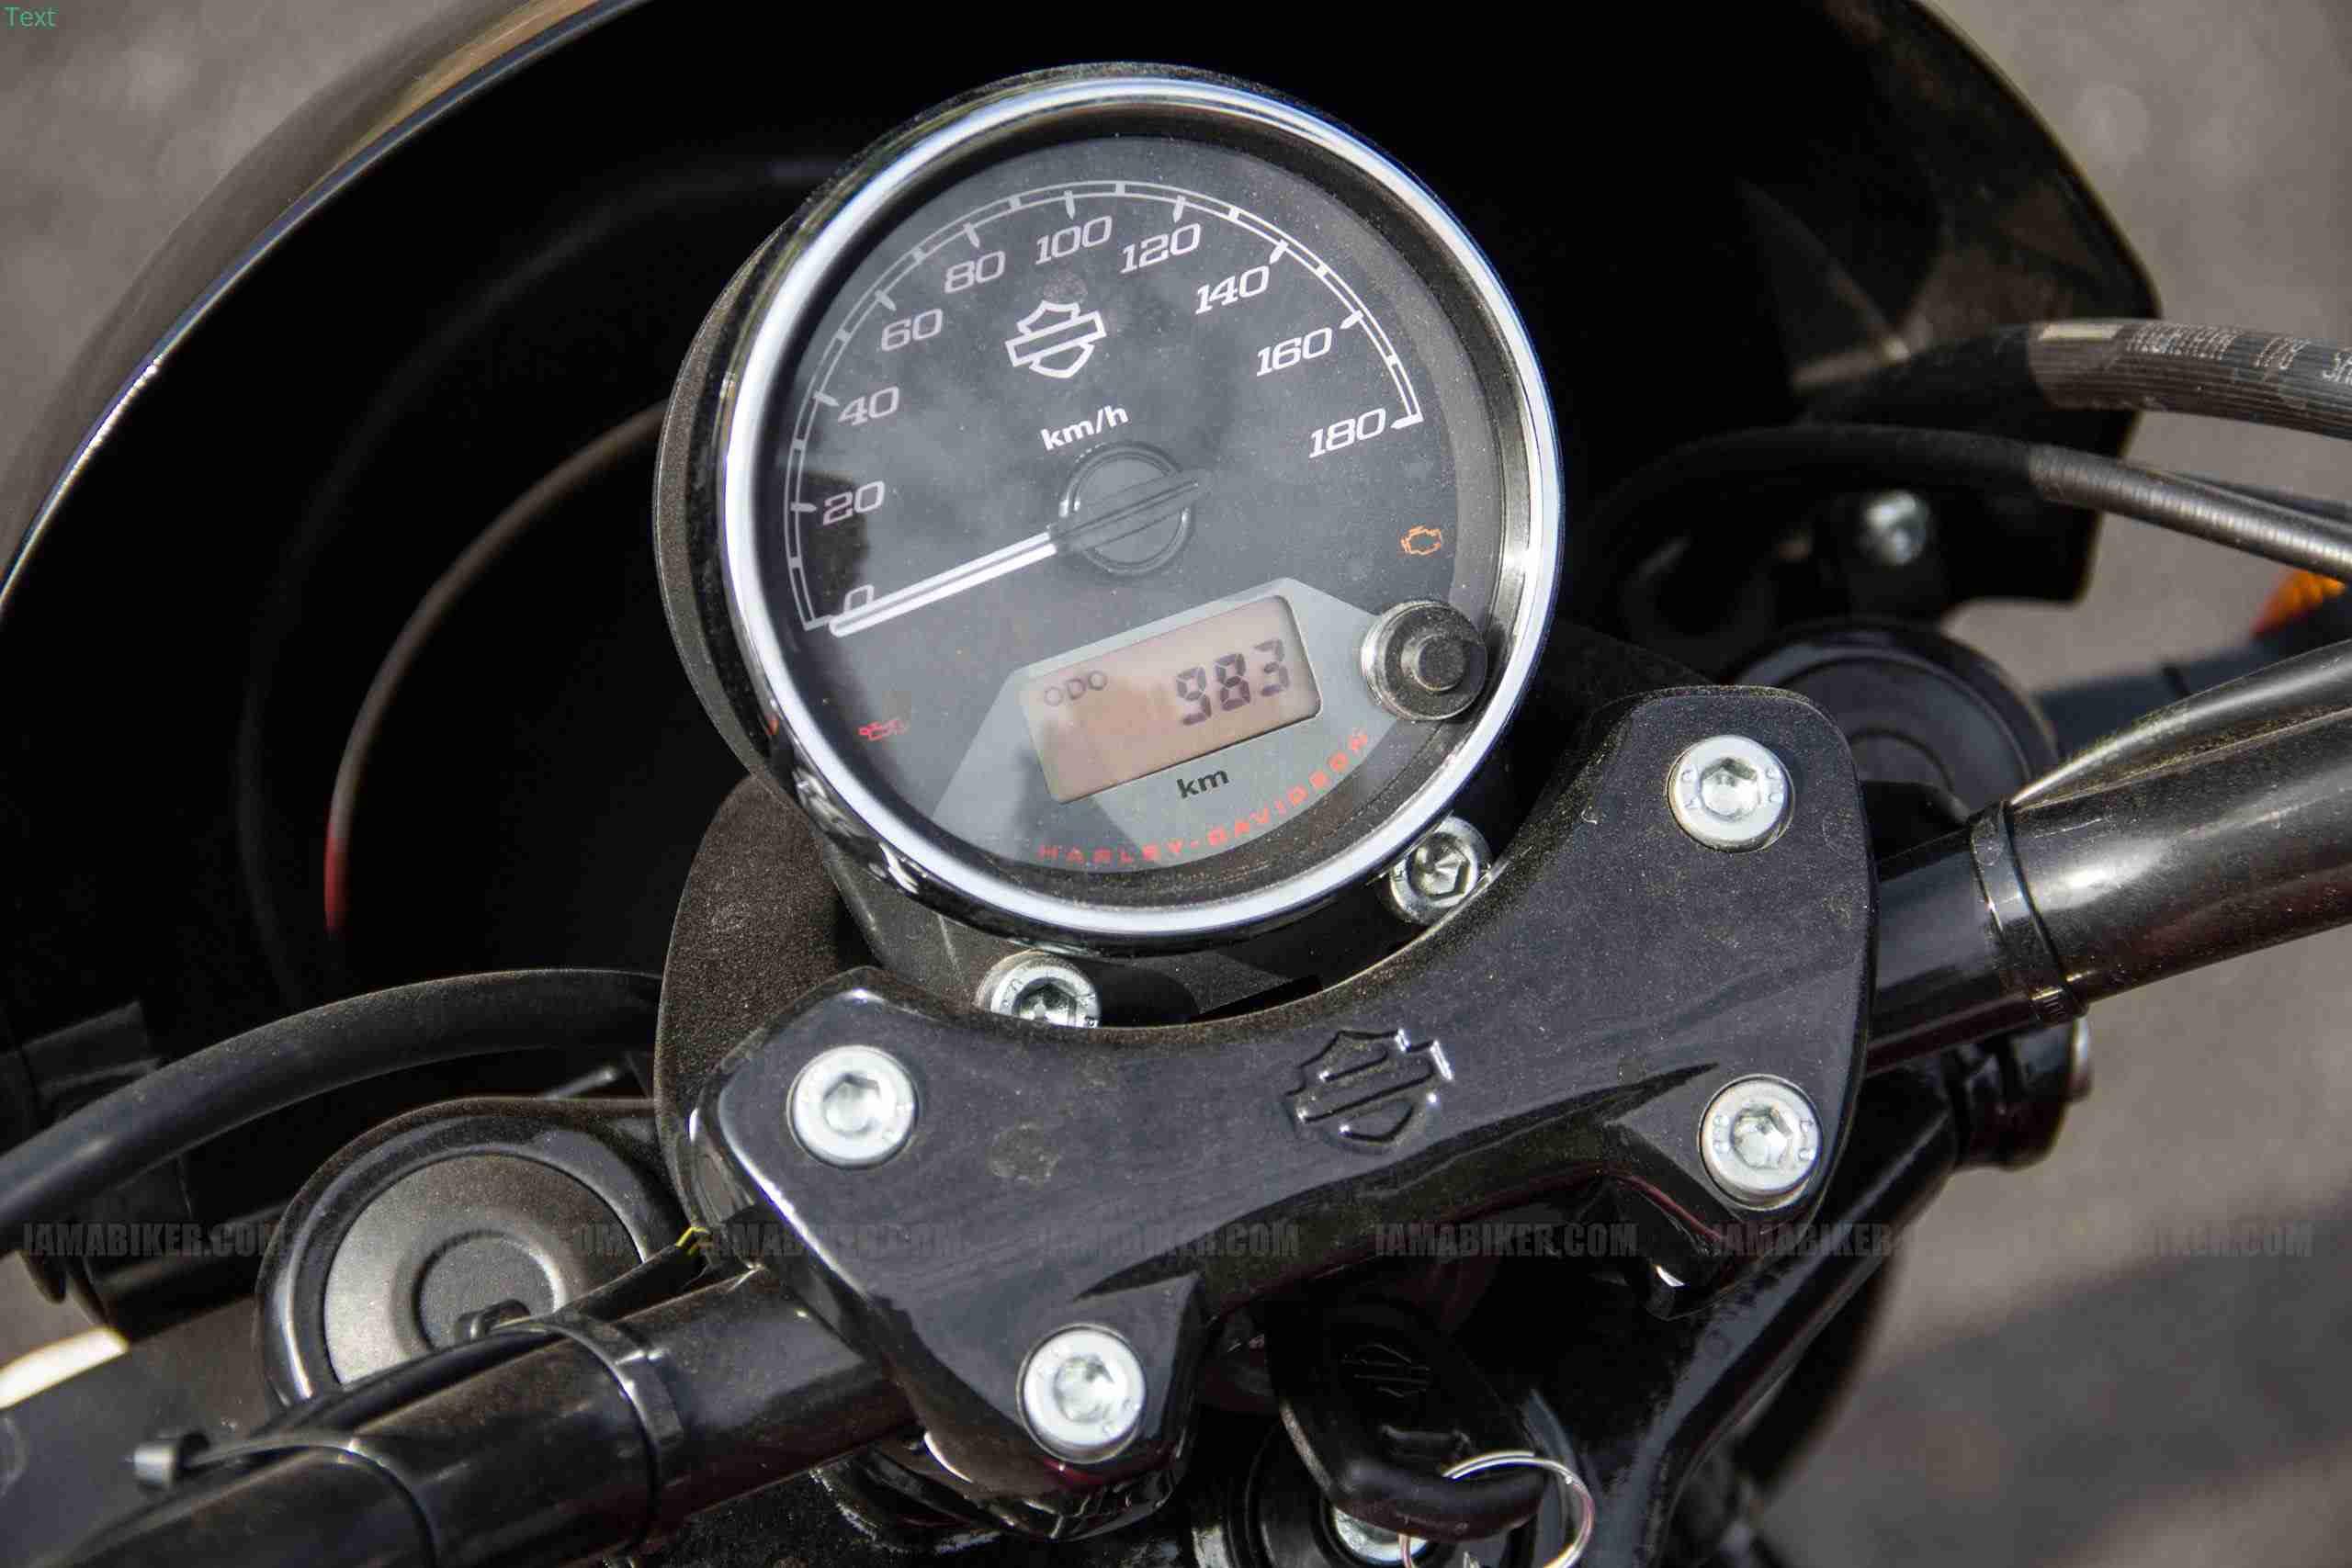 2015 Harley Davidson Street 750 review - 29